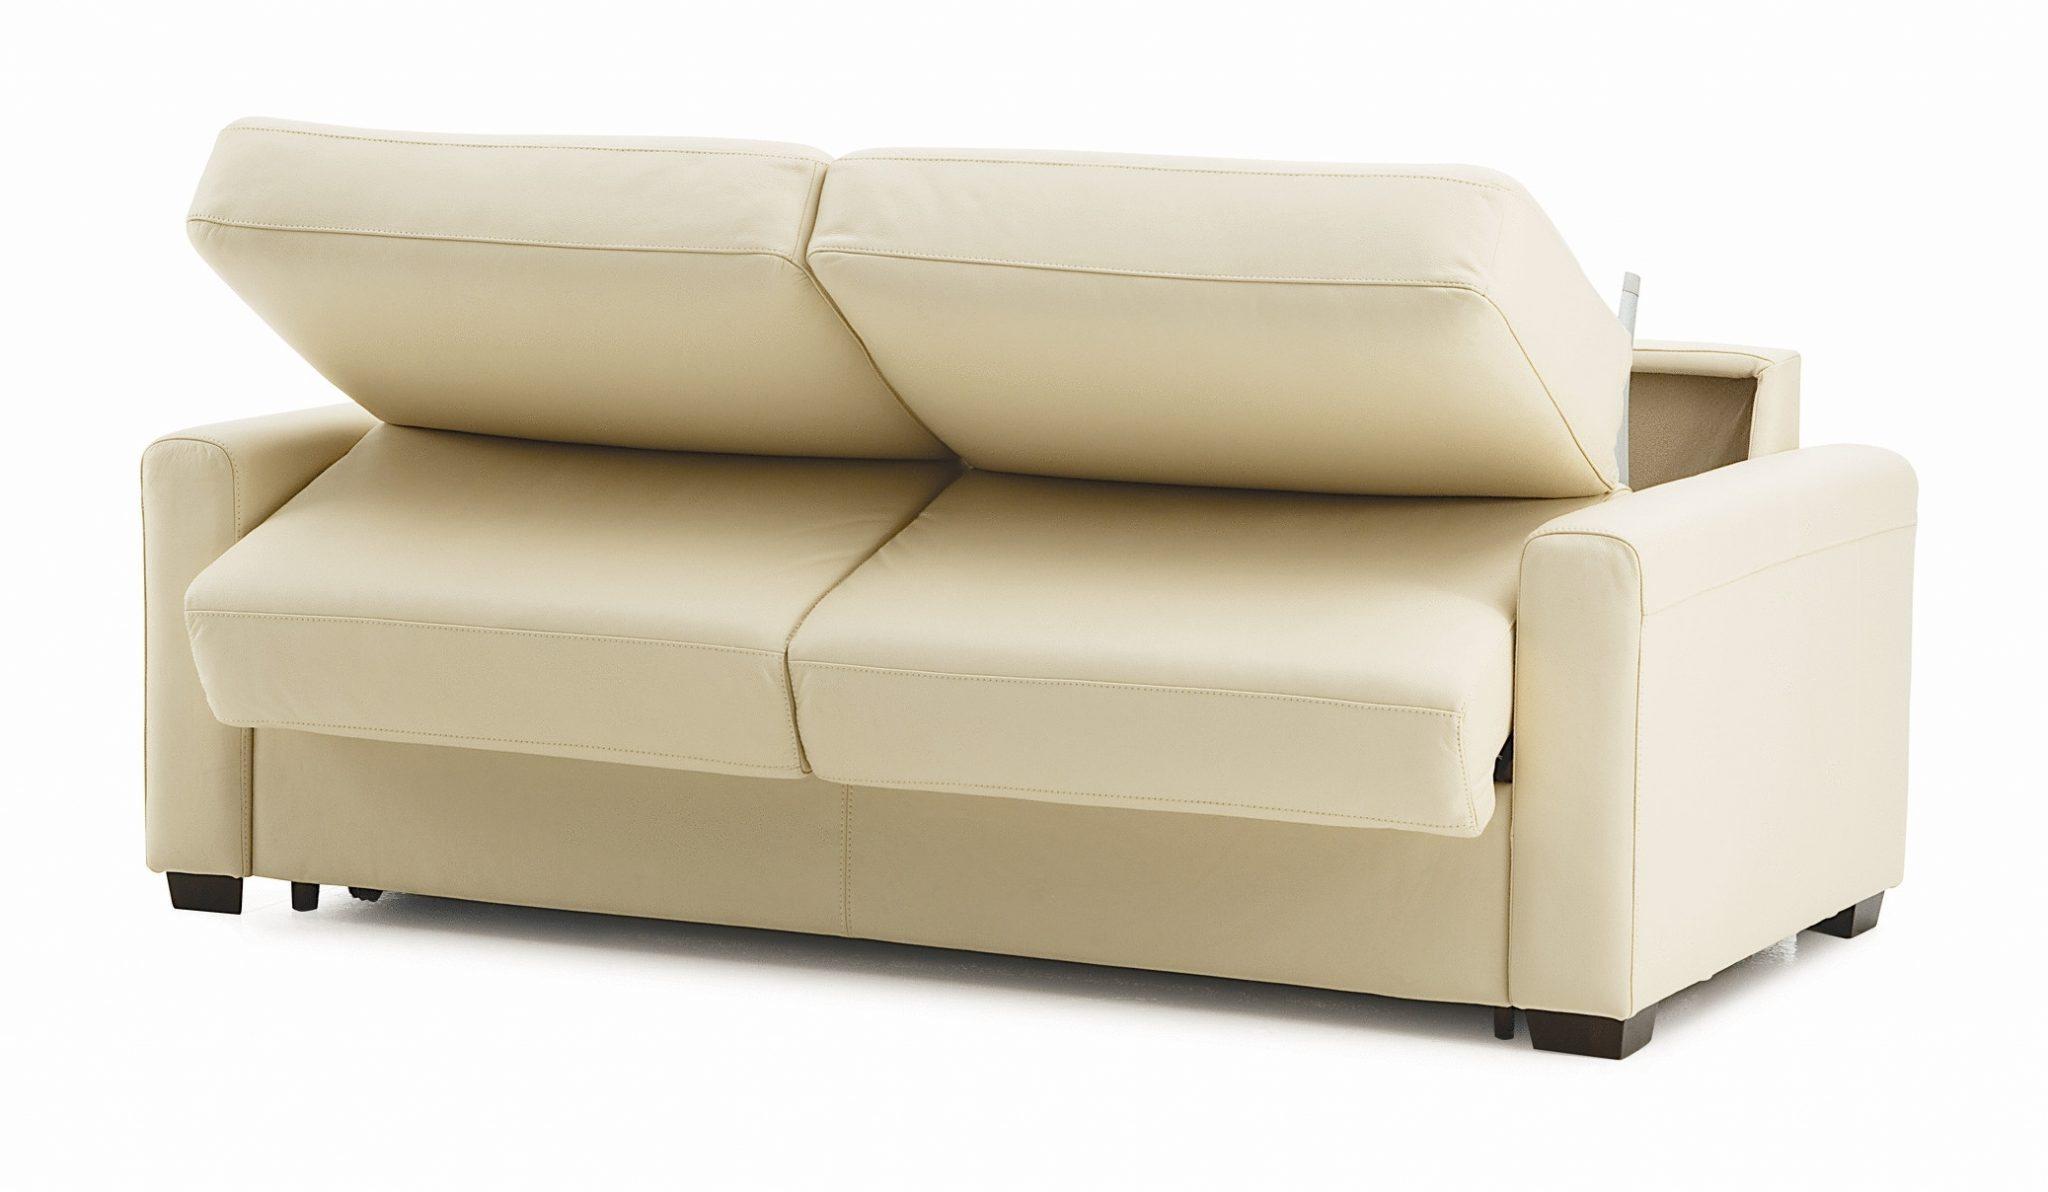 Sleeper sofa best rated   Hawk Haven